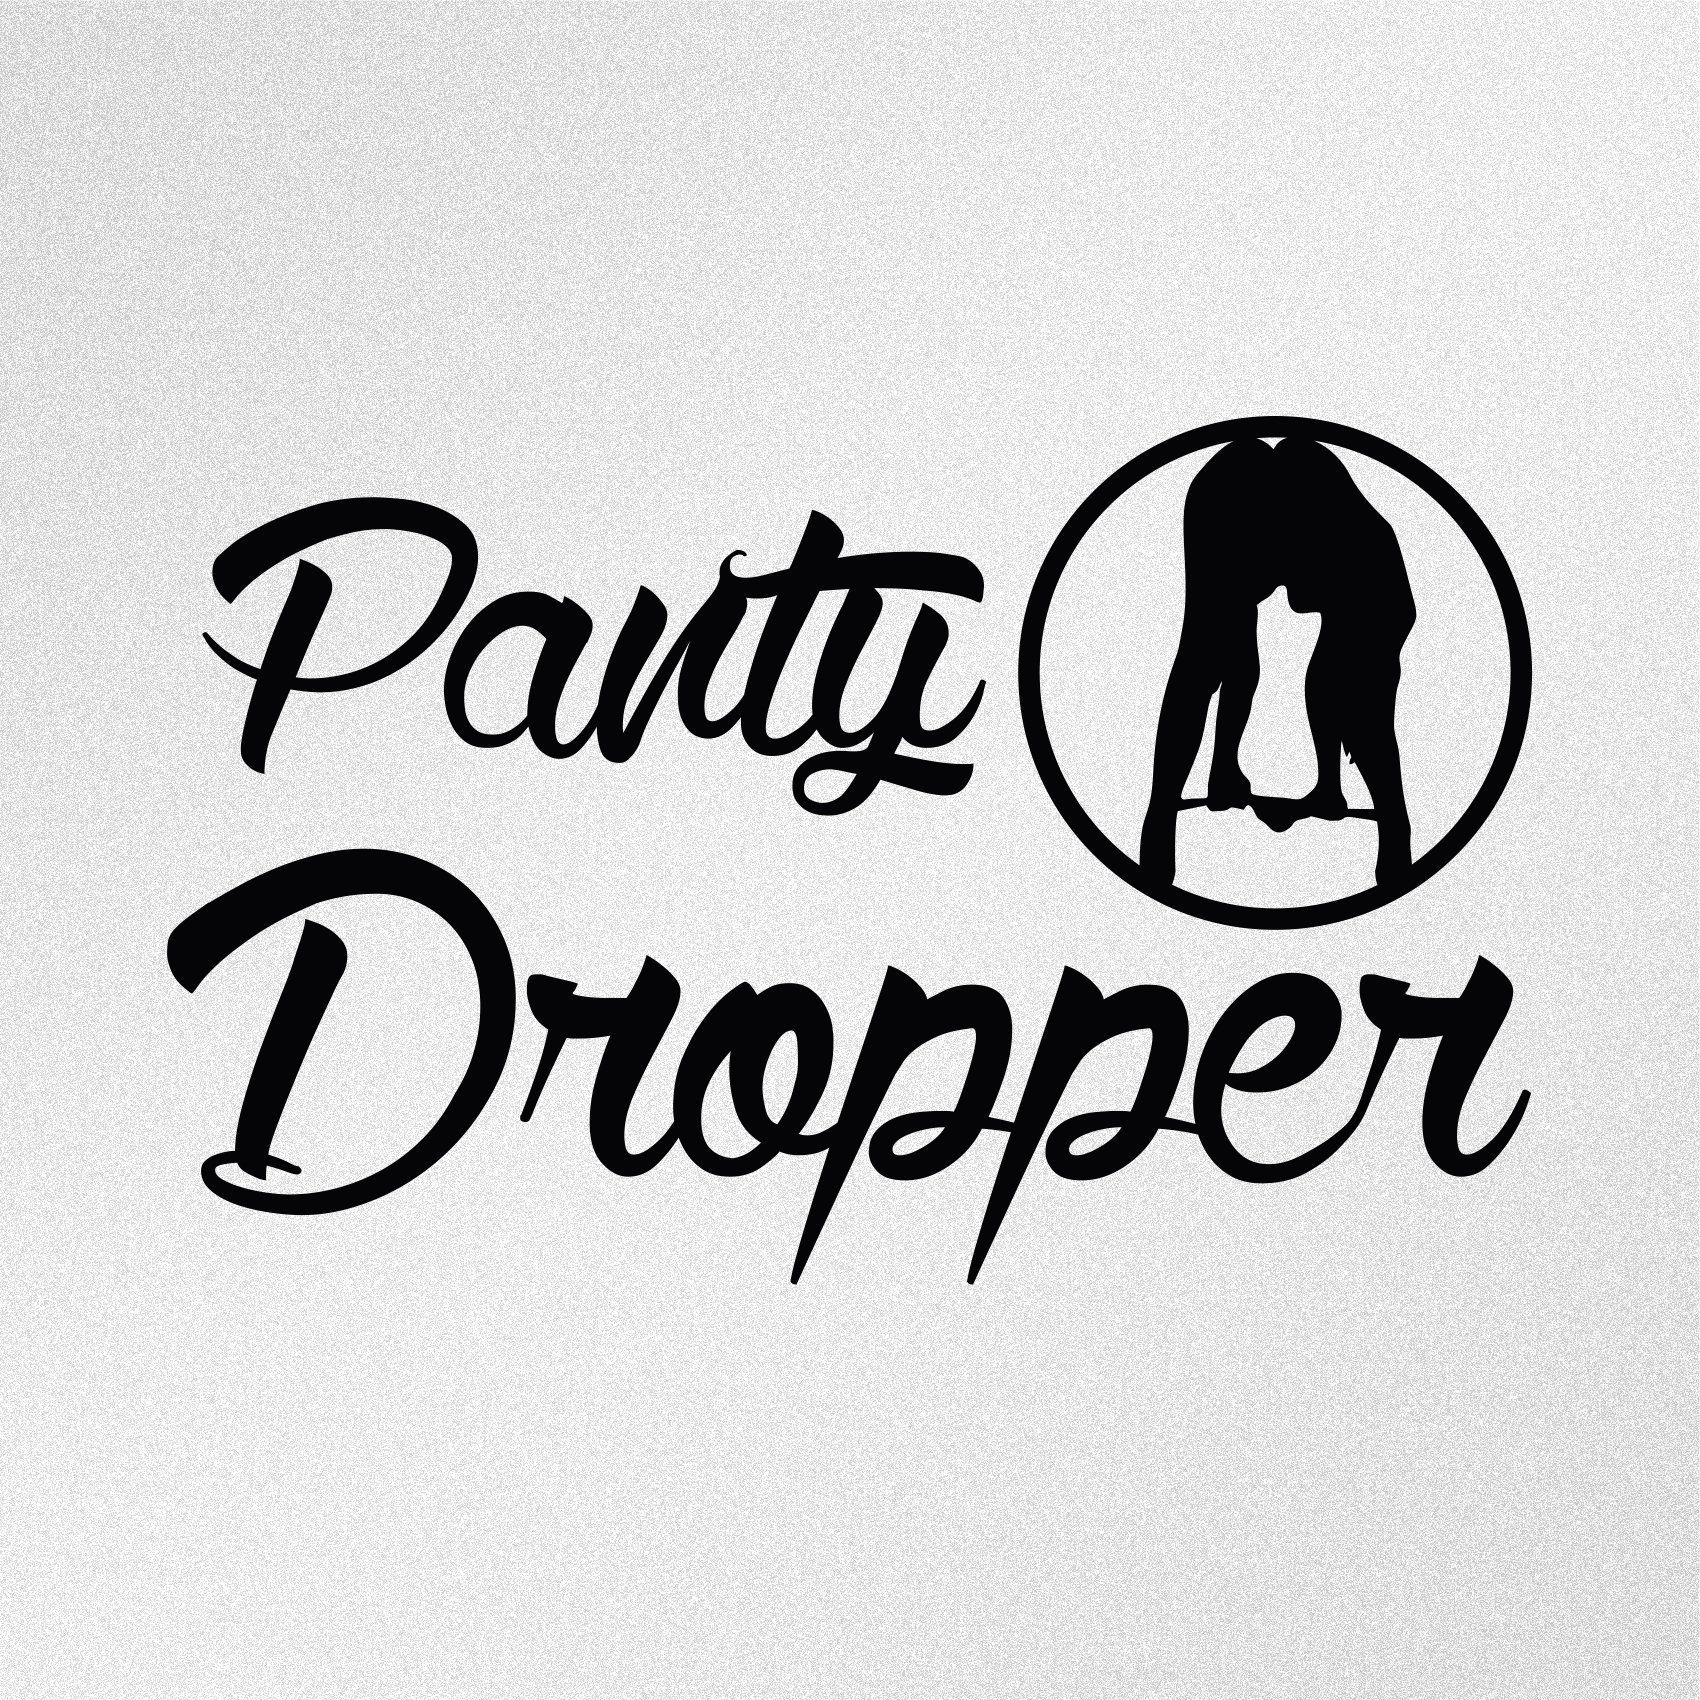 Panty Dropper Vinyl Decal Sticker In 2021 Funny Vinyl Decals Vinyl Window Decals Funny Bumper Stickers [ 1700 x 1700 Pixel ]